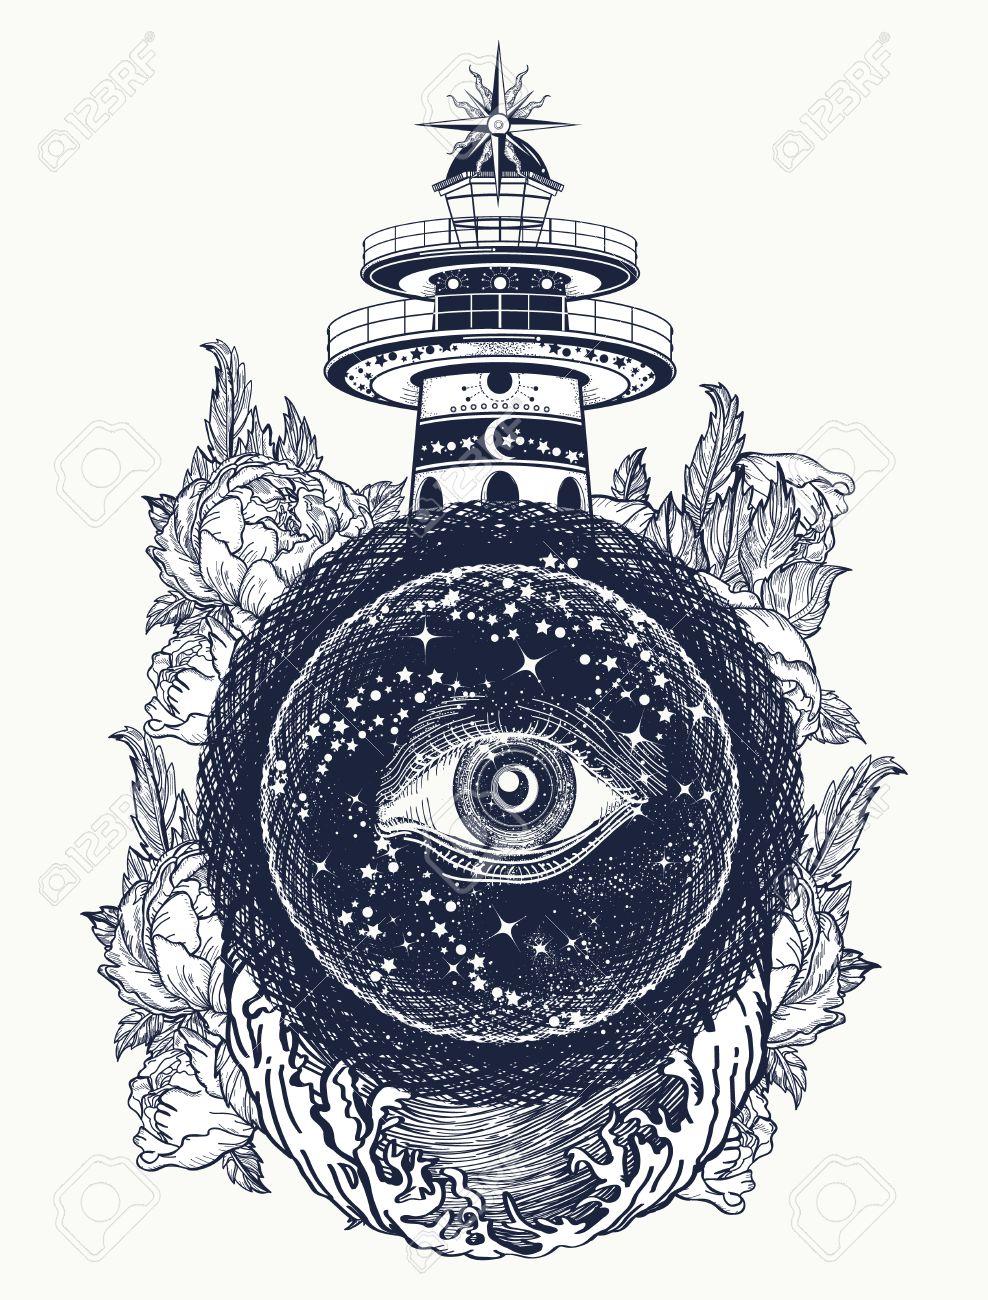 Lighthouse, roses and all seeing eye tattoo. Freemason, spiritual, illuminati, secret and mystical signs tattoo. Lighthouse in the storm, and the all seeing eye t-shirt design - 67158629